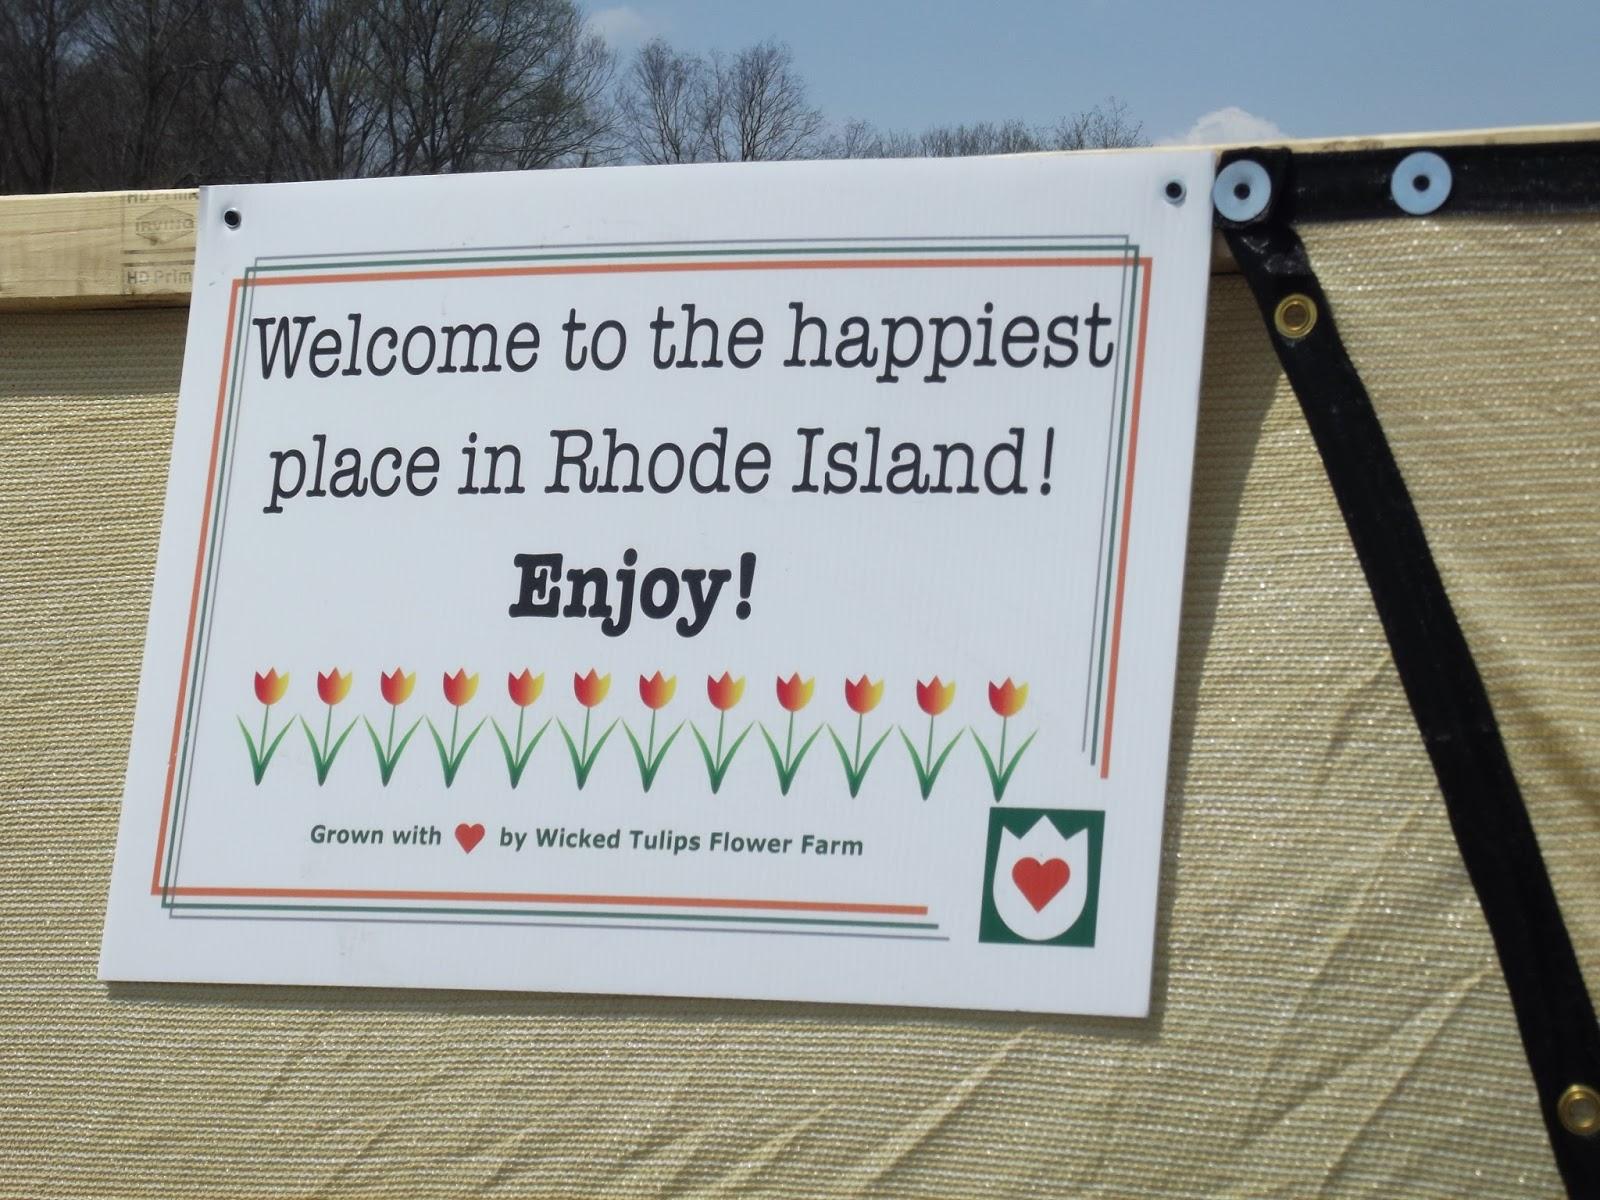 The Old Granite Step: Wicked Tulips Flower Farm; Johnston, Rhode Island